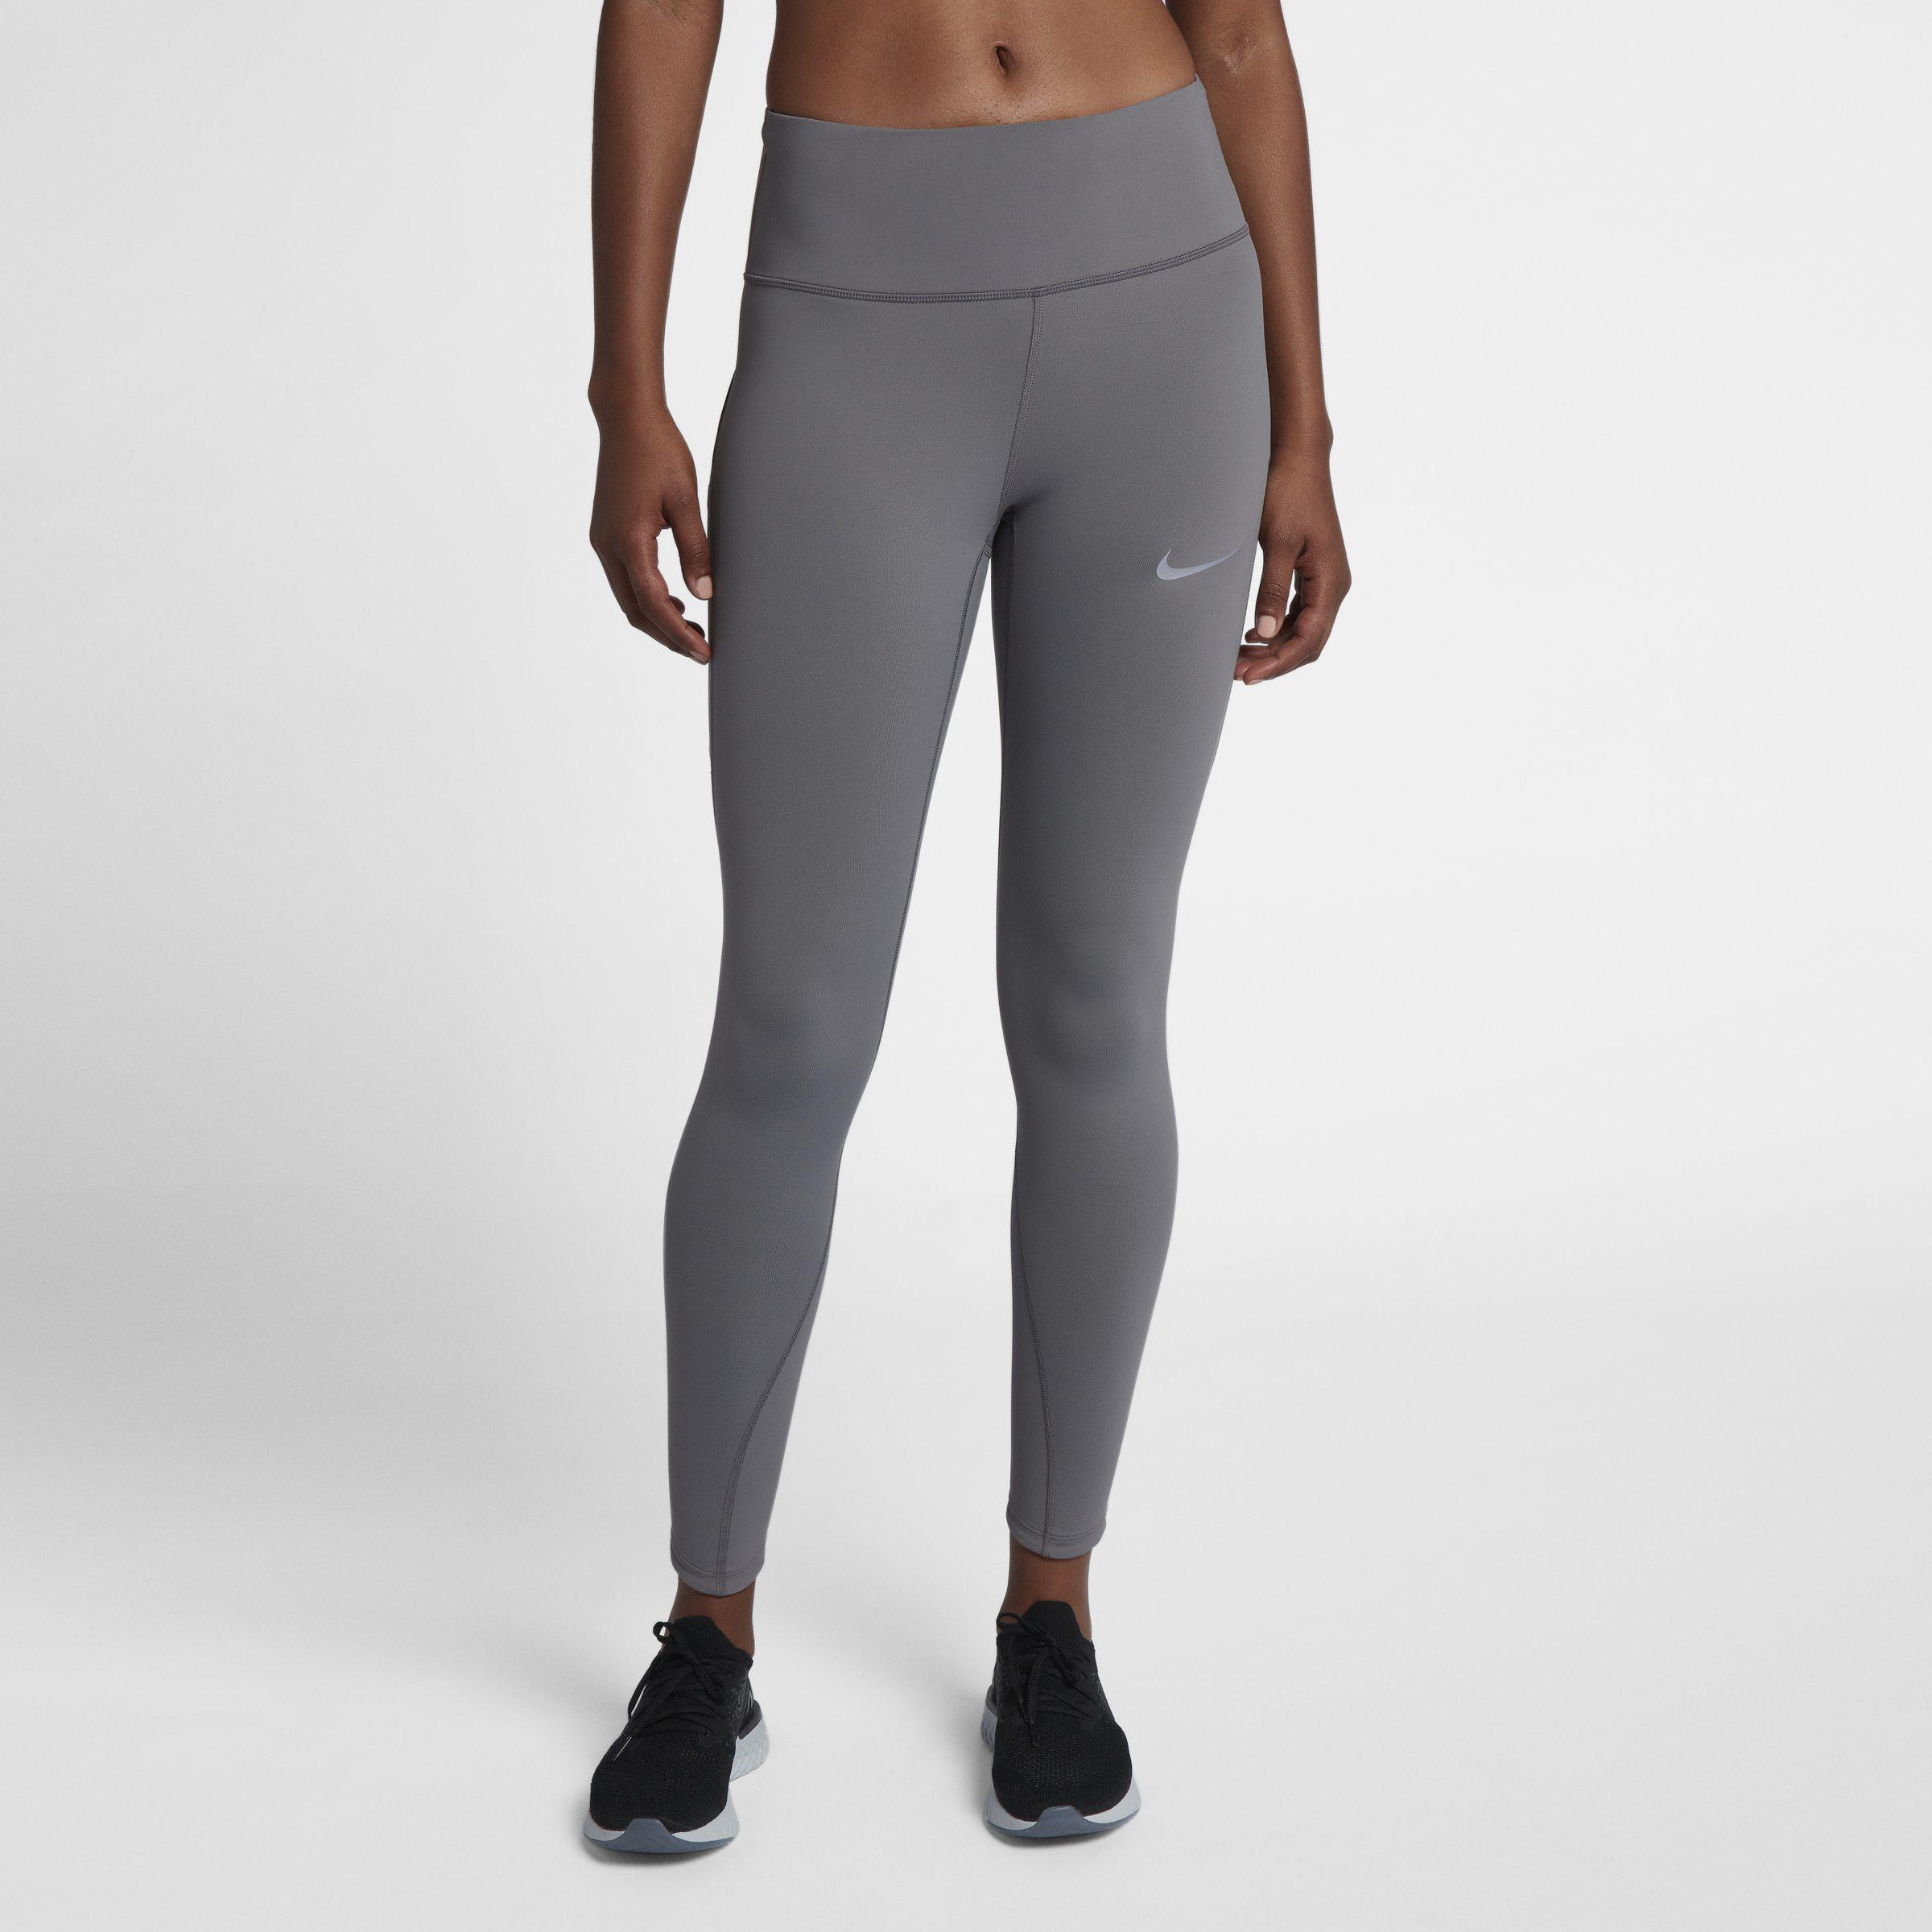 3c587032143671 Gallery. Previously sold at: Nike · Women's Chinos Women's Orange Leggings  ...